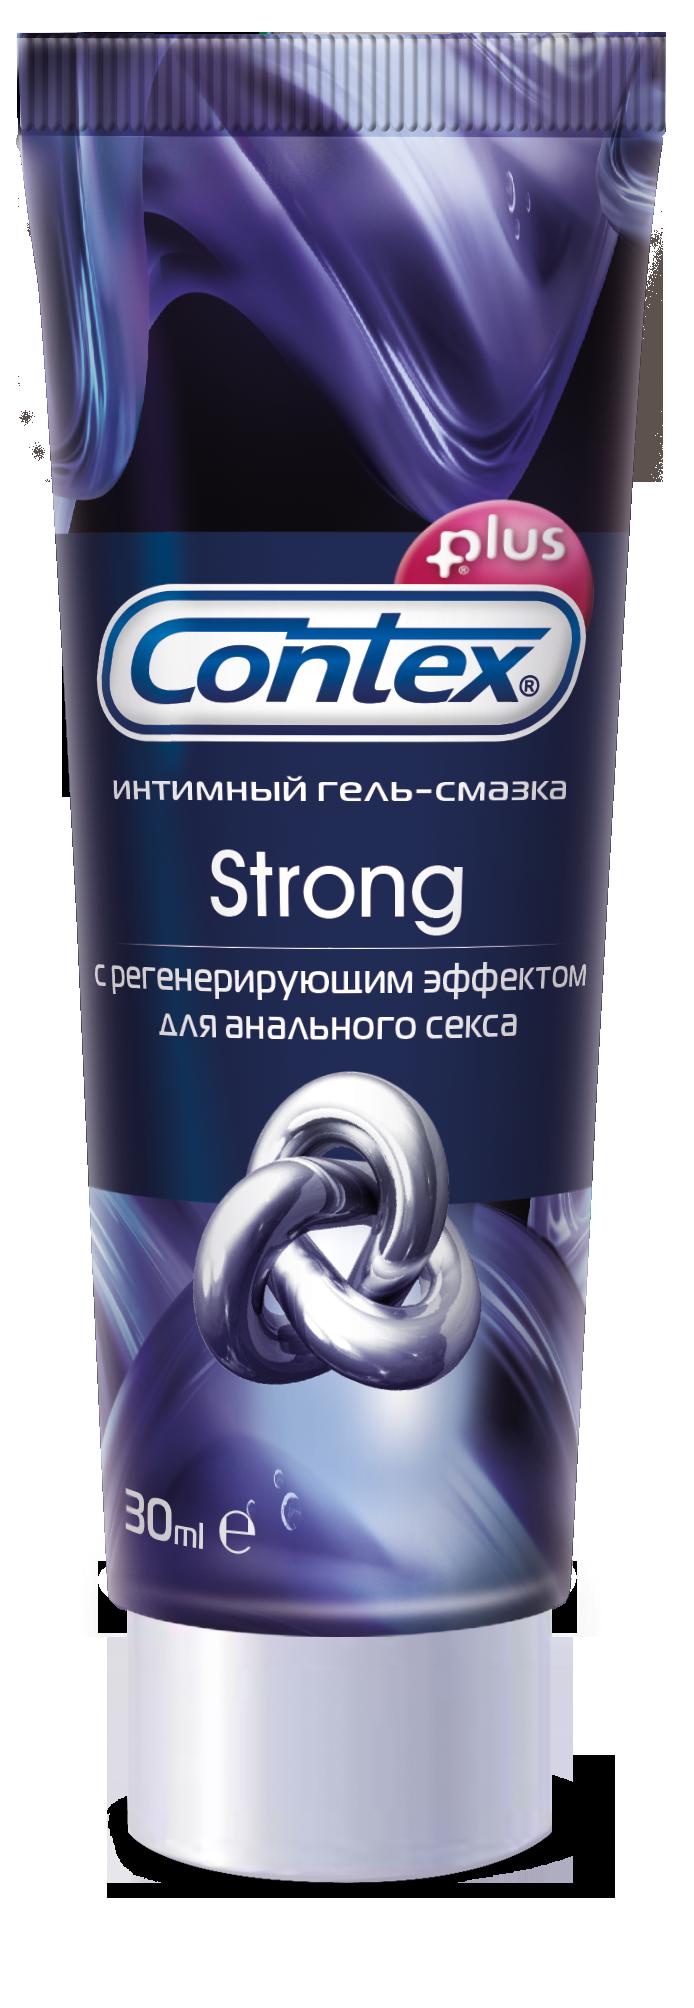 Contex гель-смазка